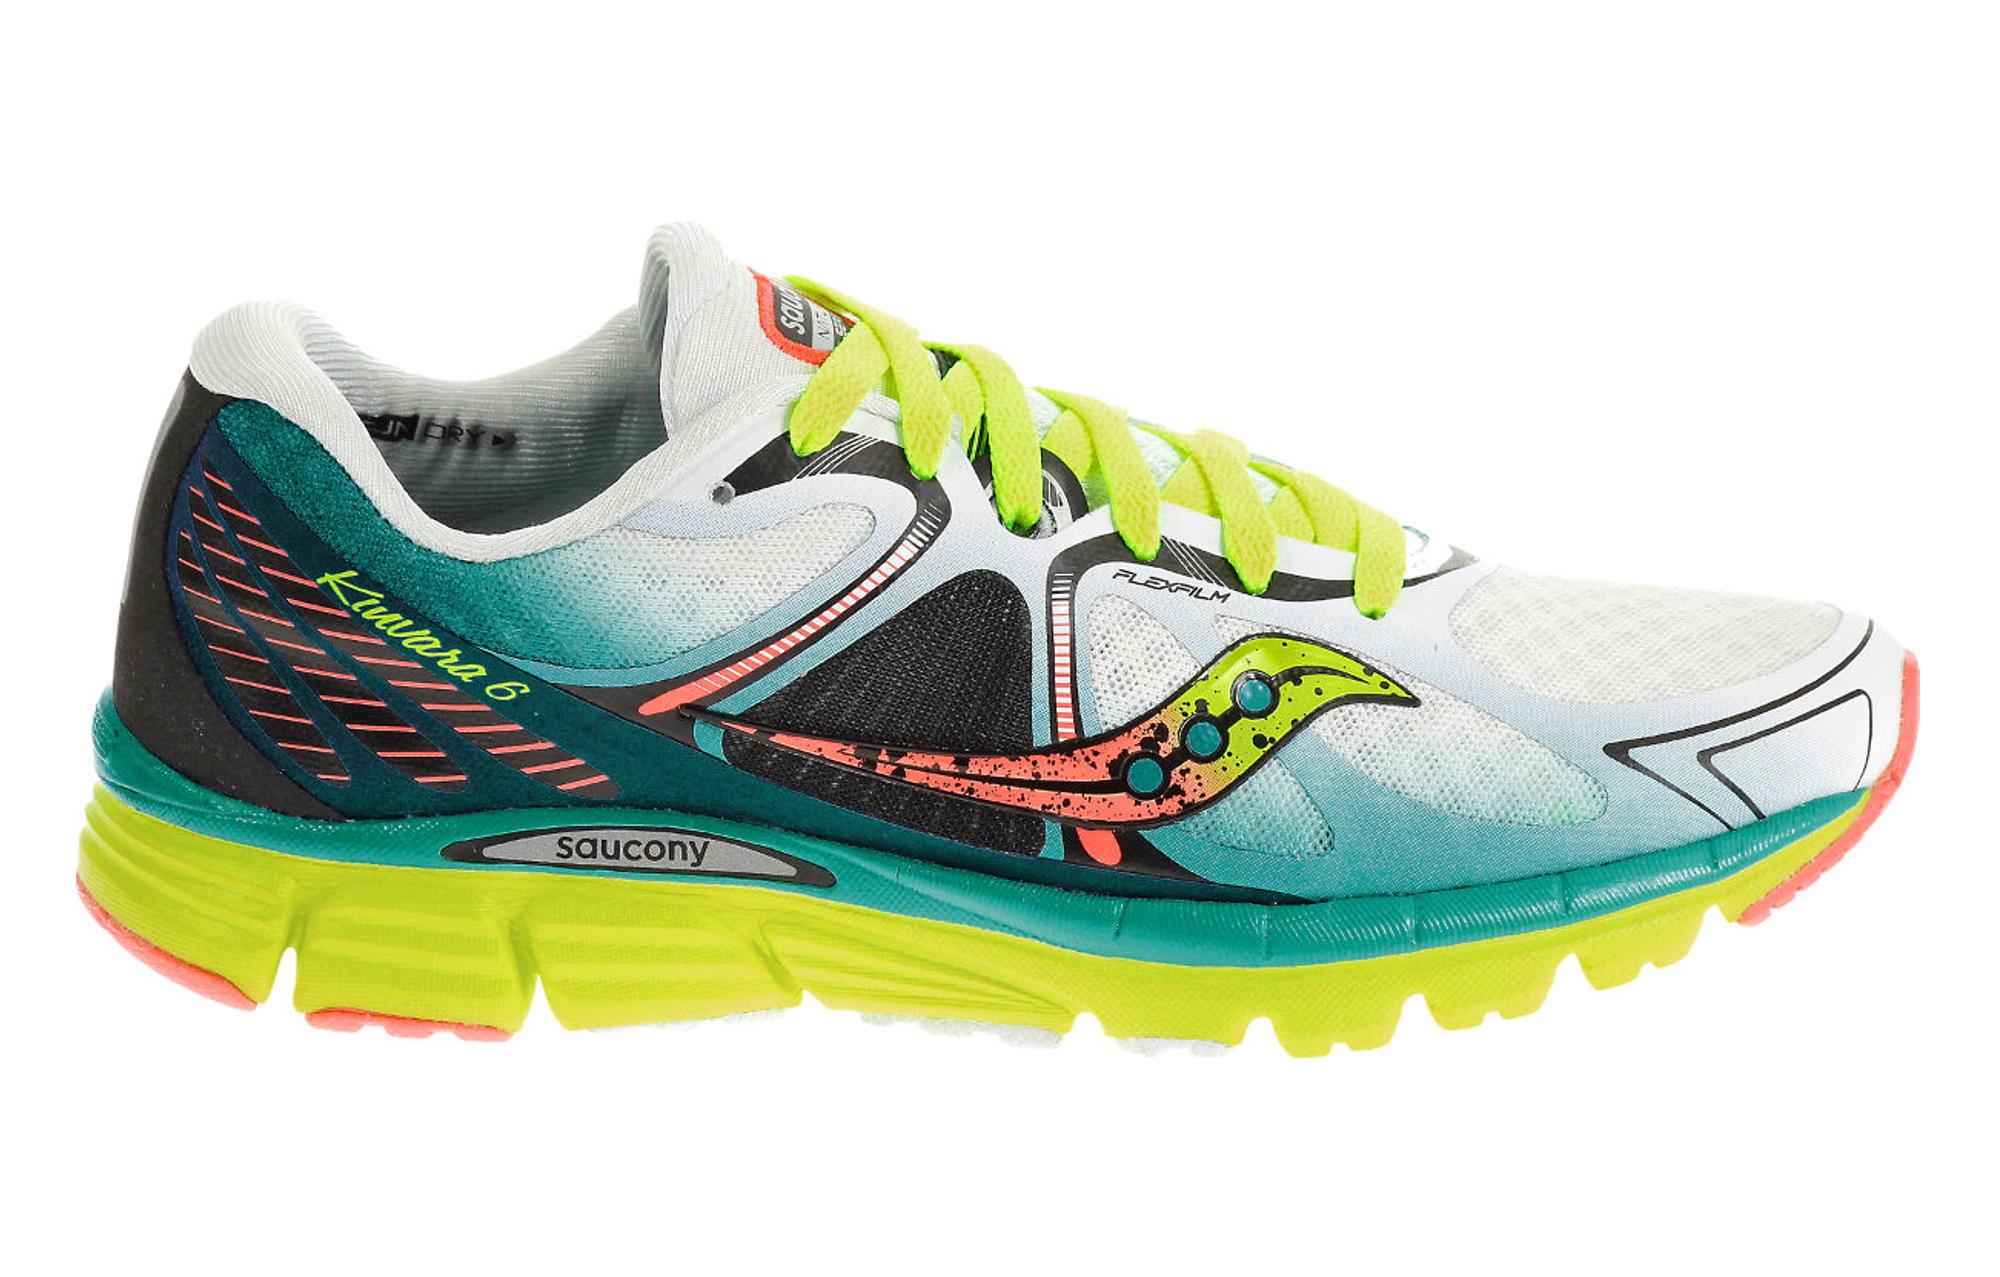 dc75874e577d Saucony Kinvara 6 Womens Running Shoes